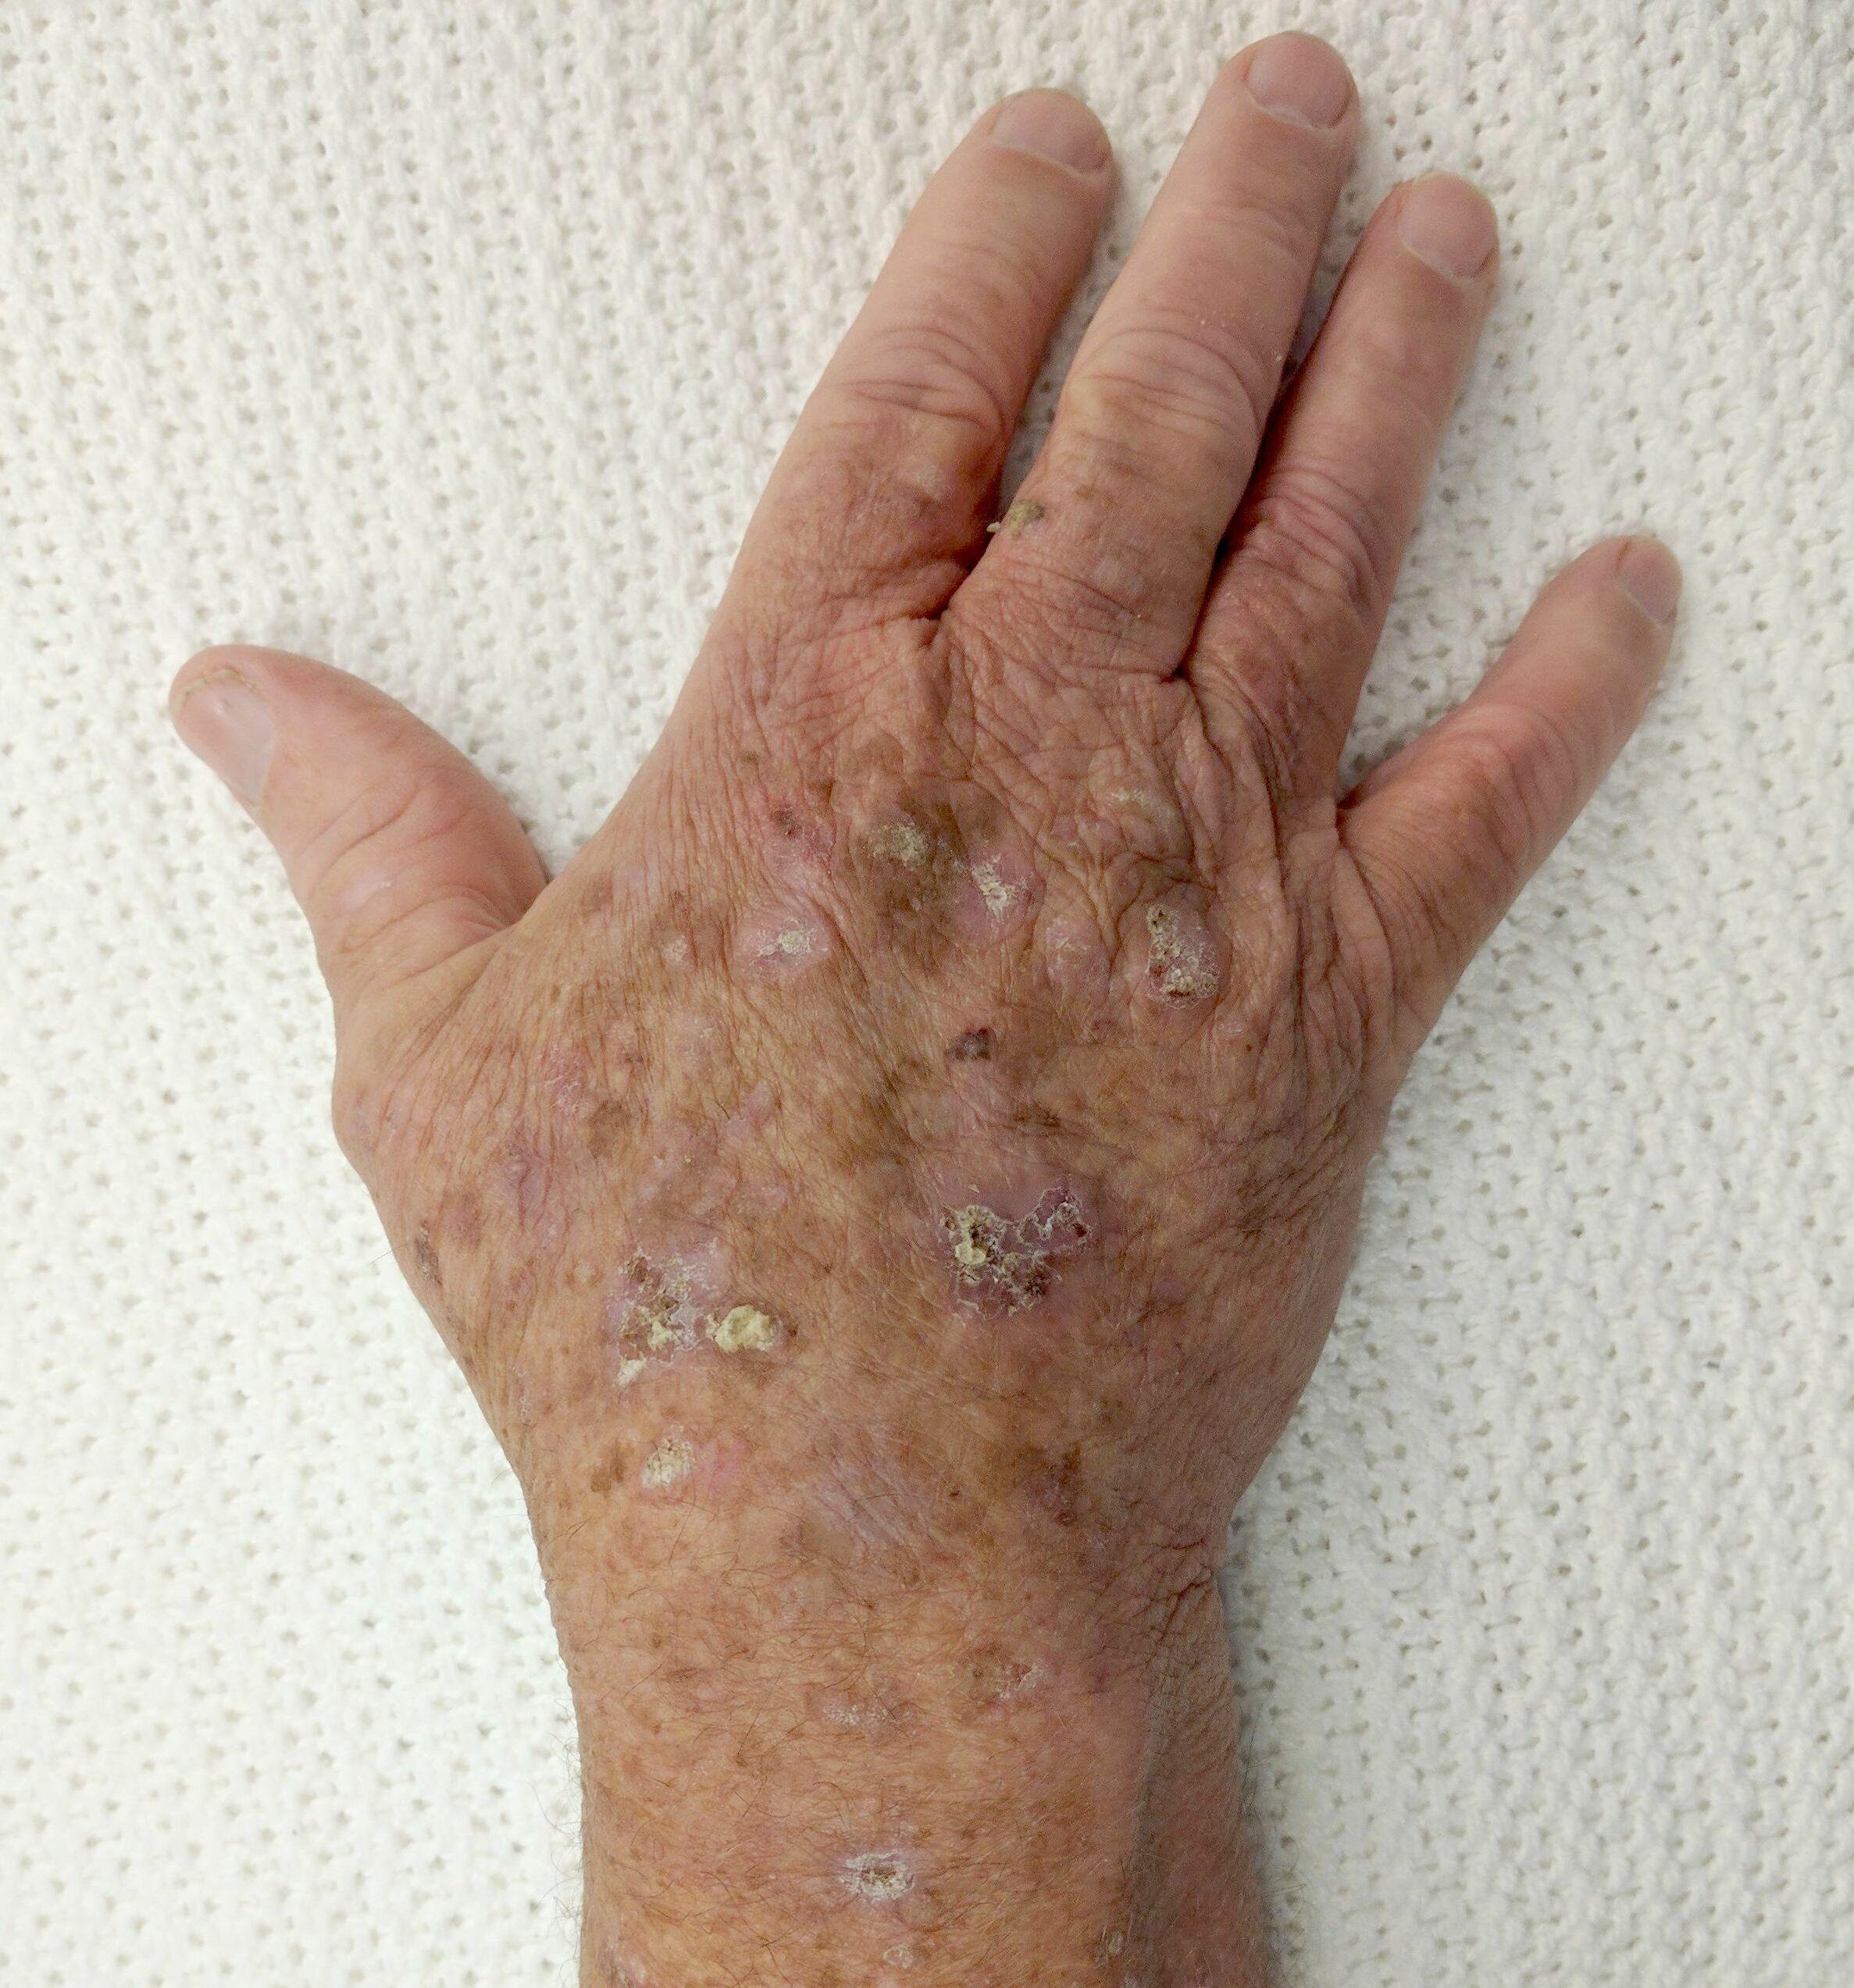 Herpes simplex de tip 1 - Papiloma